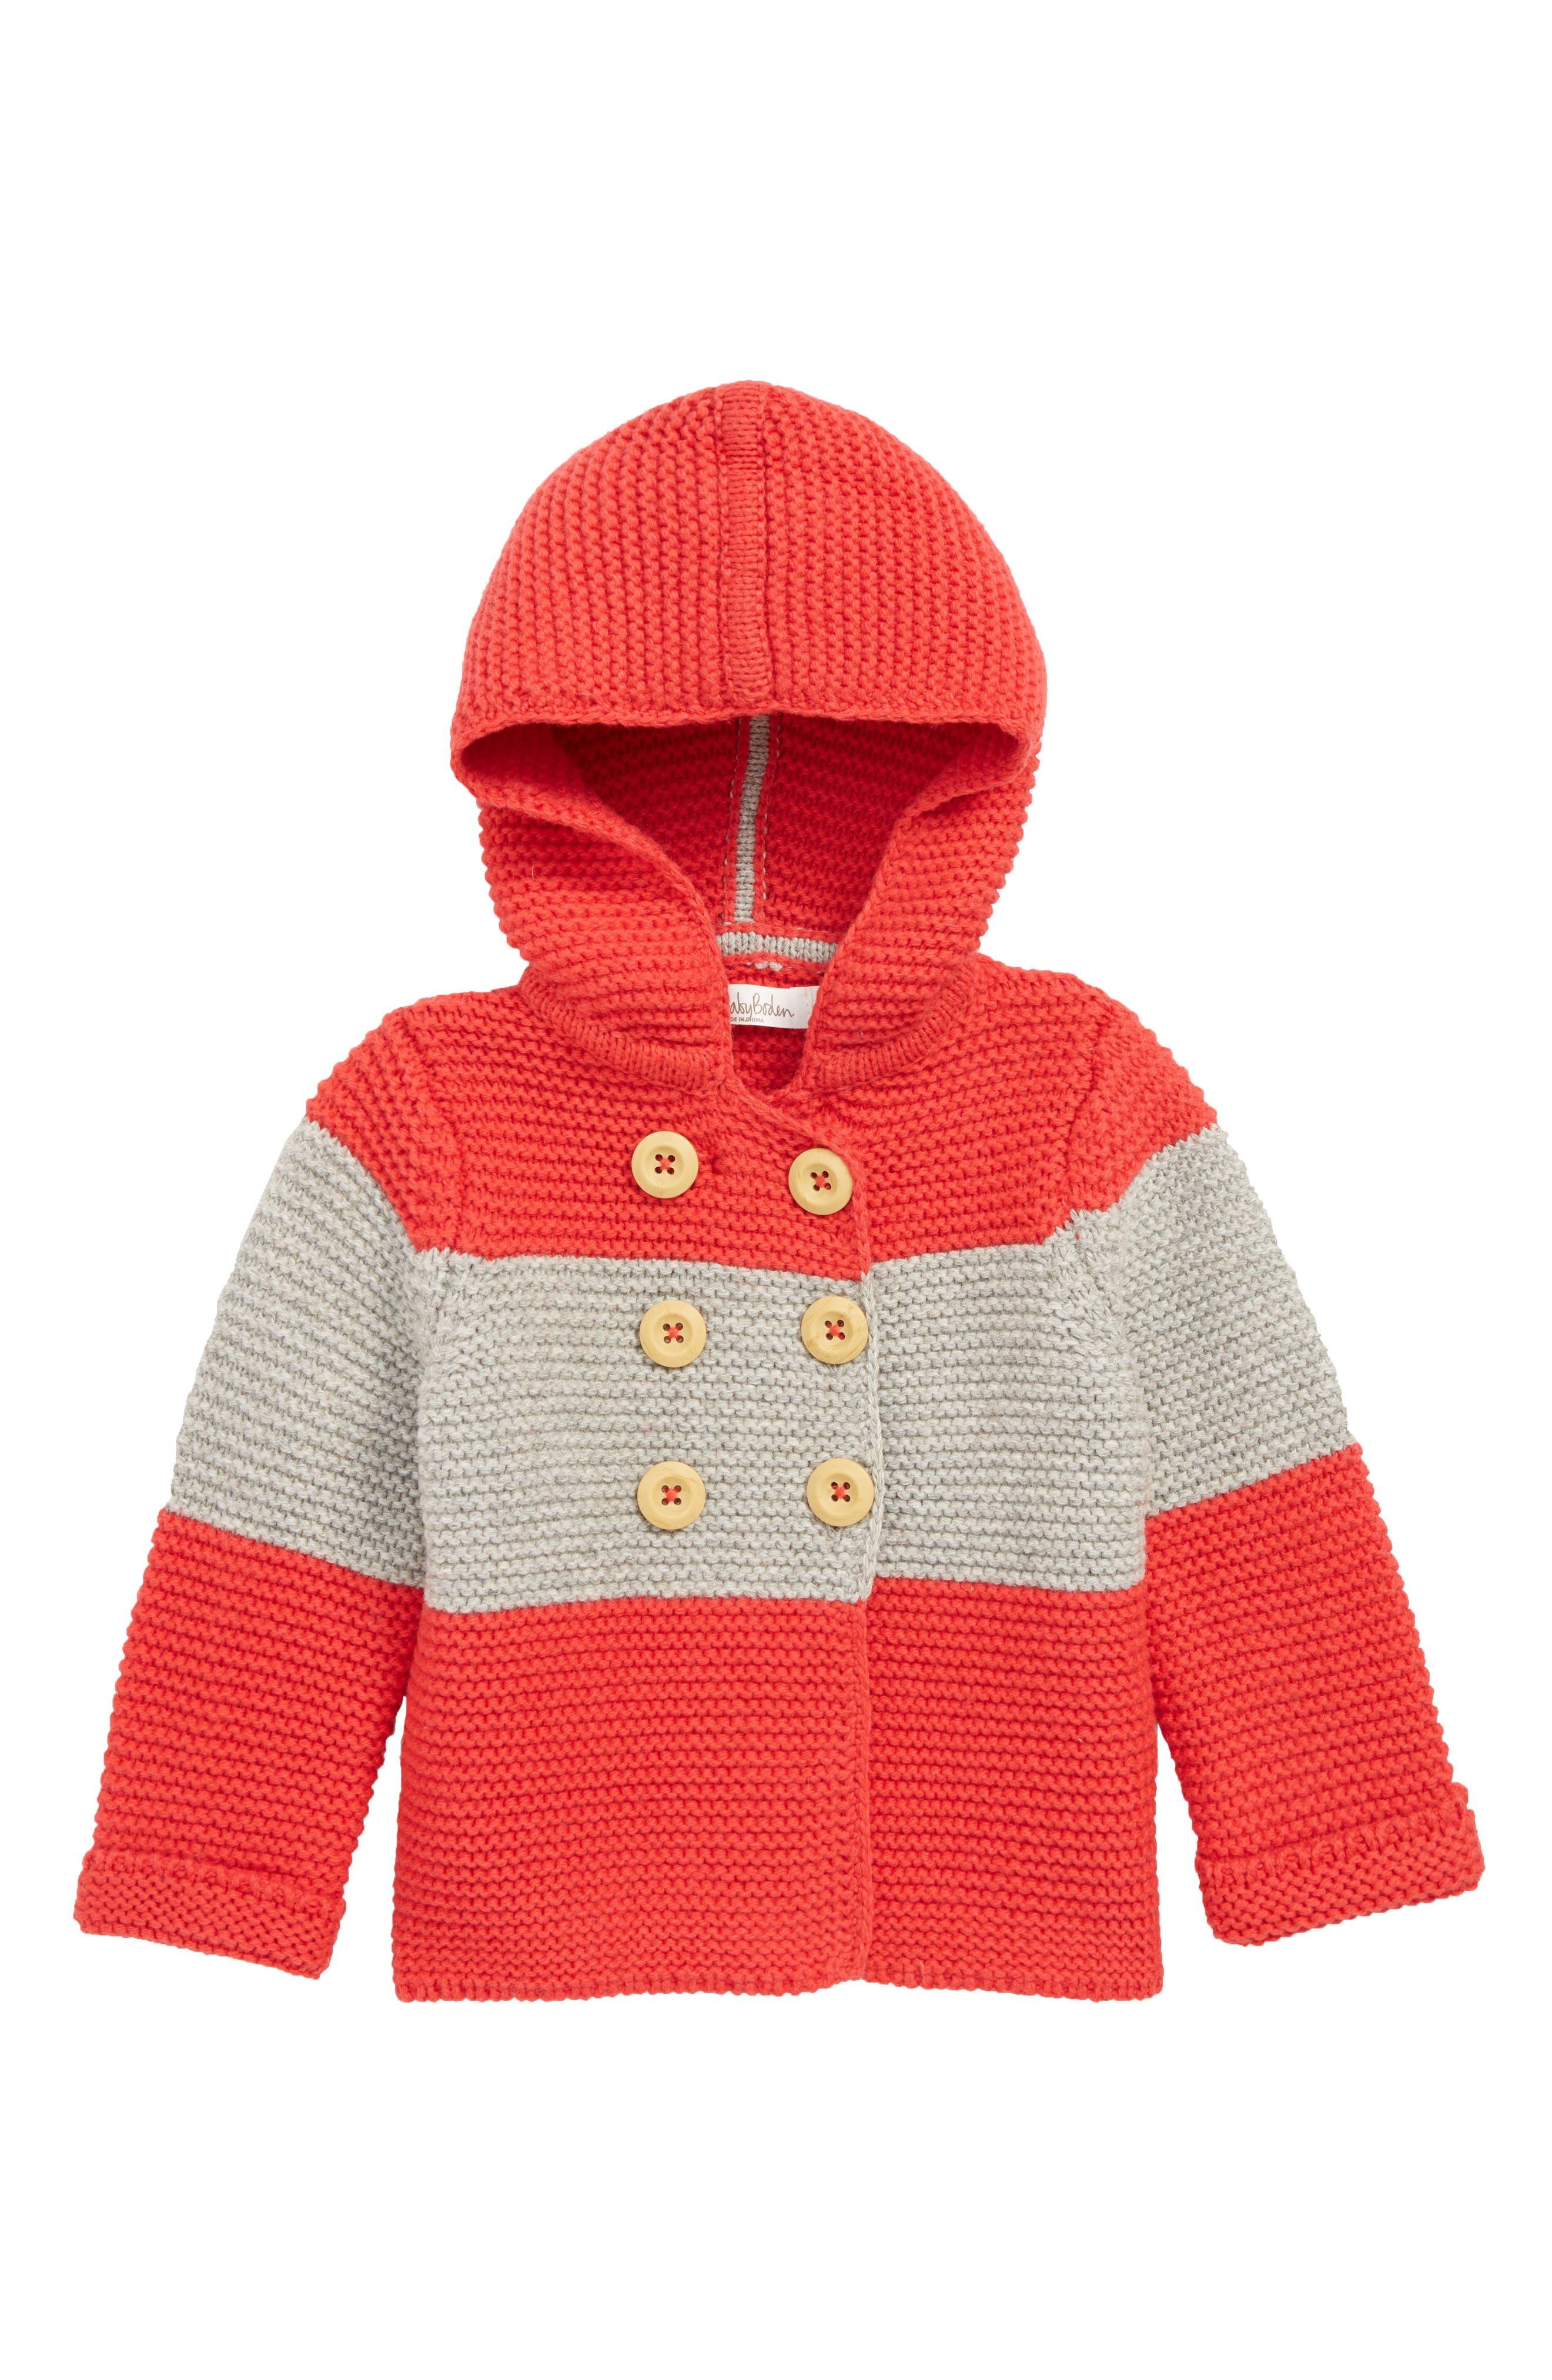 MINI BODEN Colorblock Knit Jacket, Main, color, 614